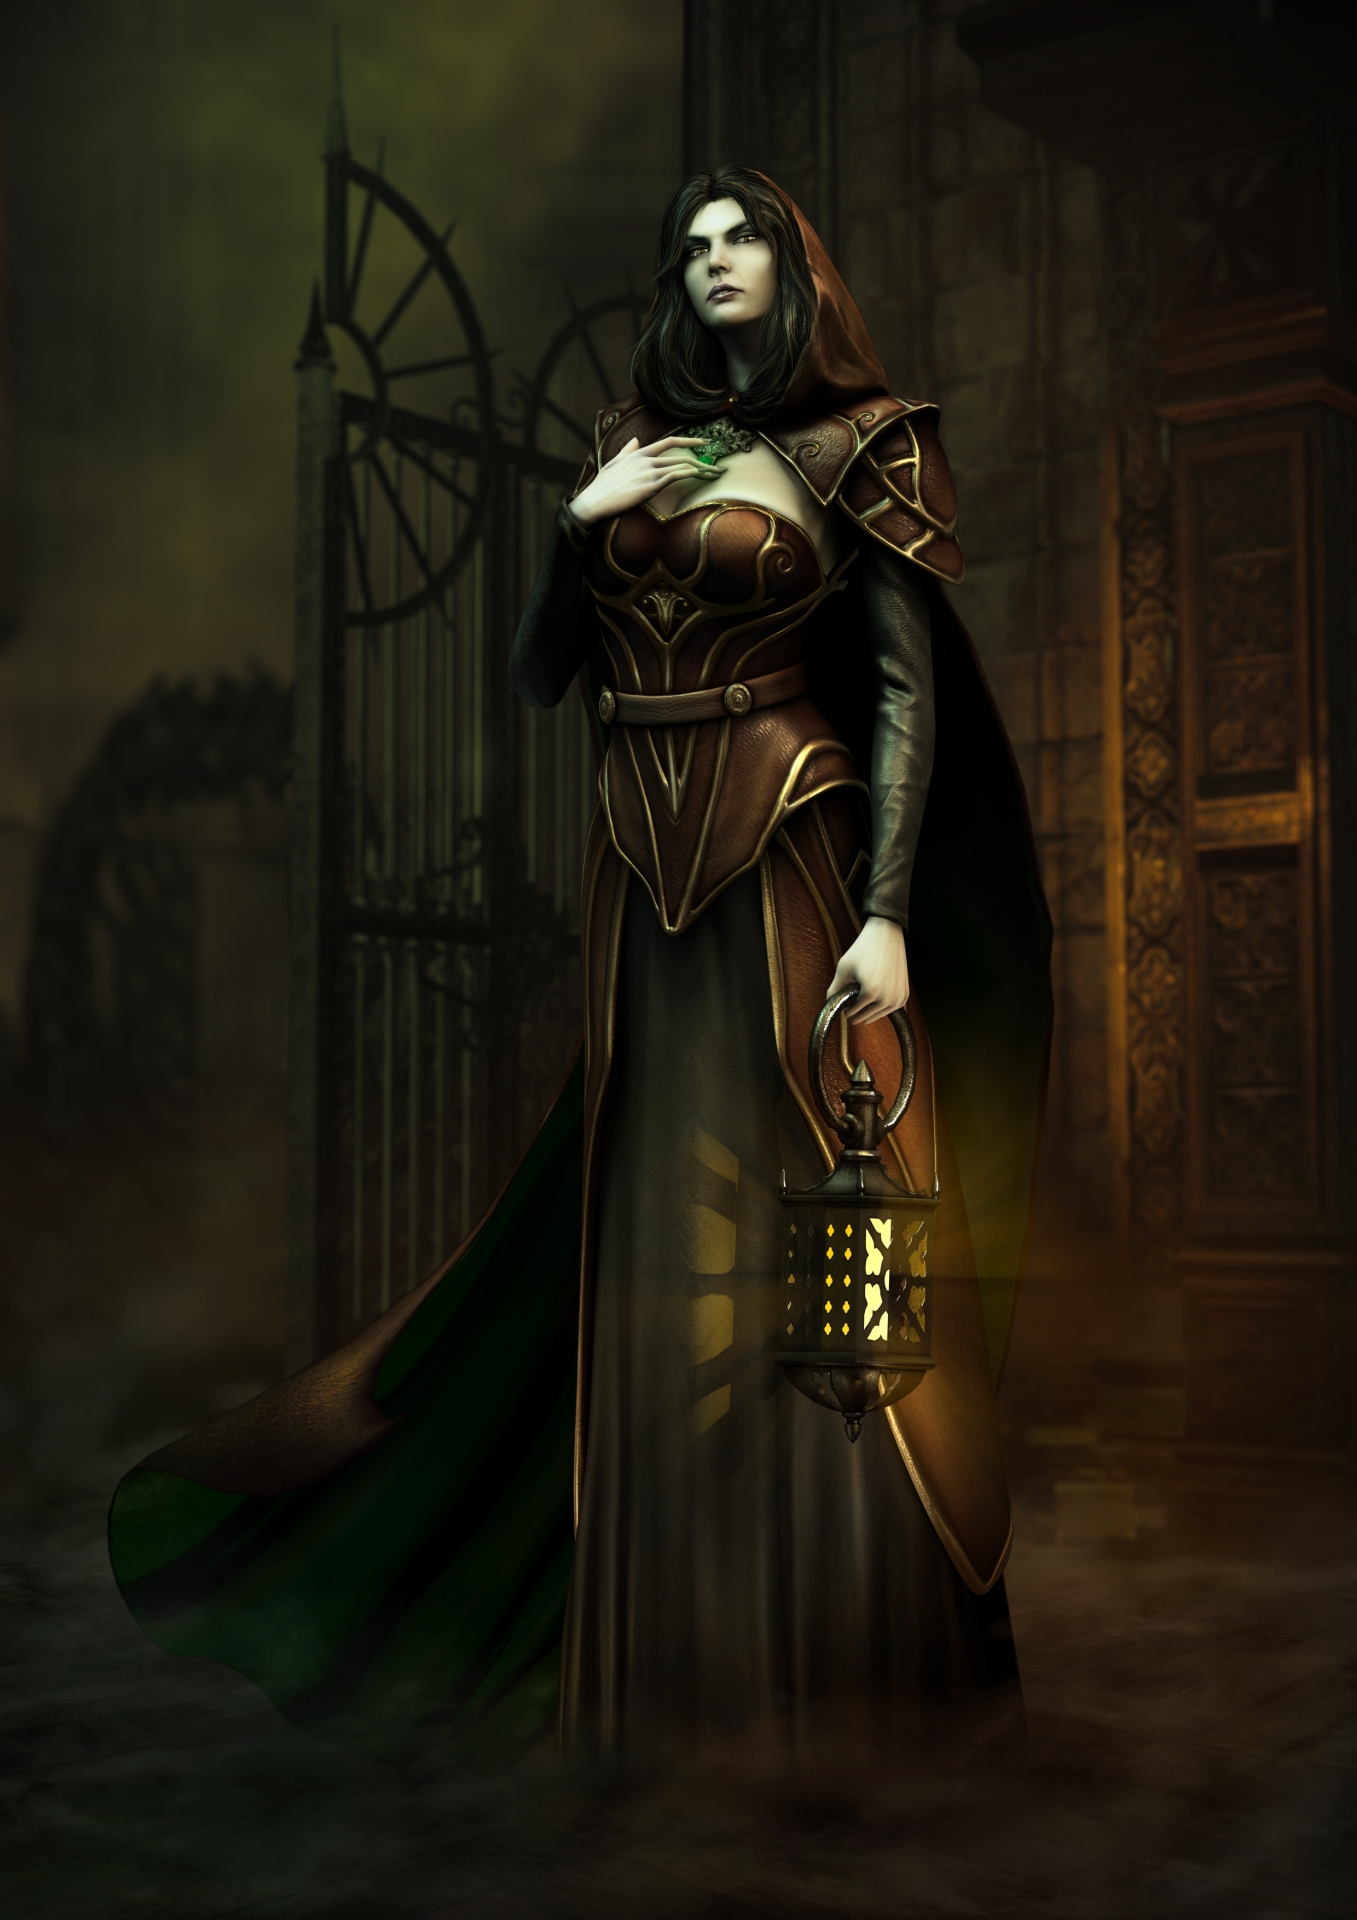 Tajemně krásné artworky z Castlevania: Lords of Shadow 2 86788